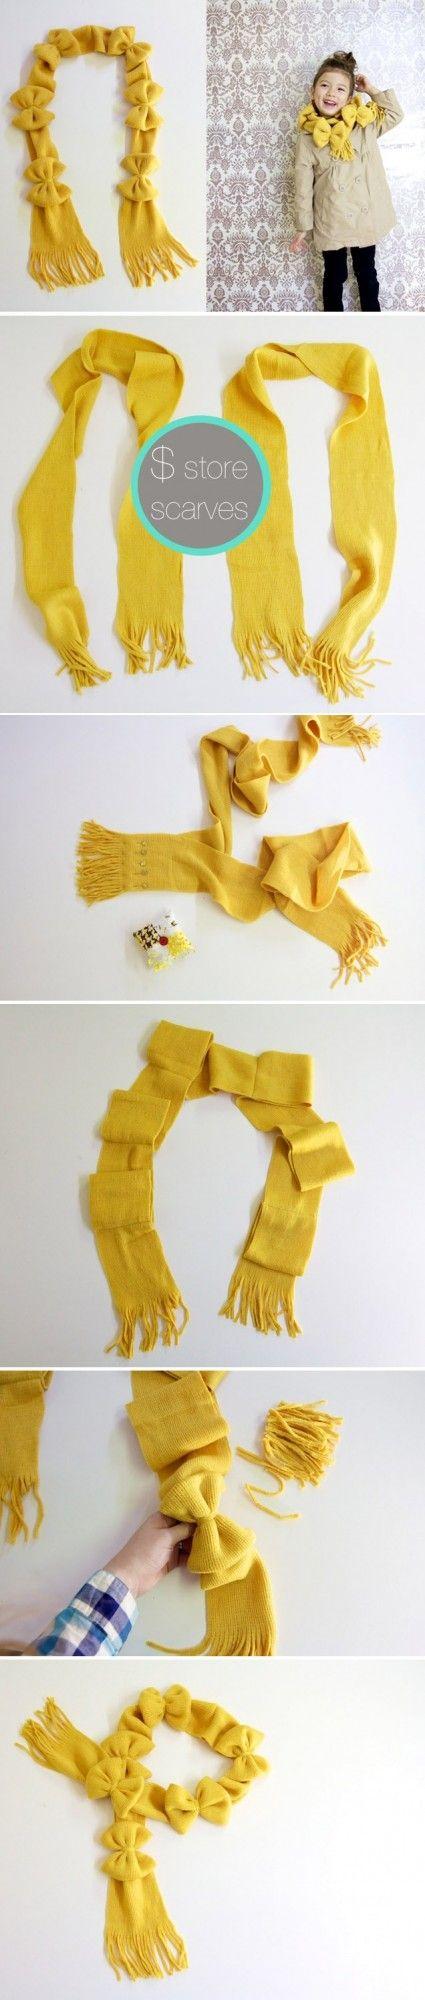 34 Creative and Useful DIY Fashion Ideas